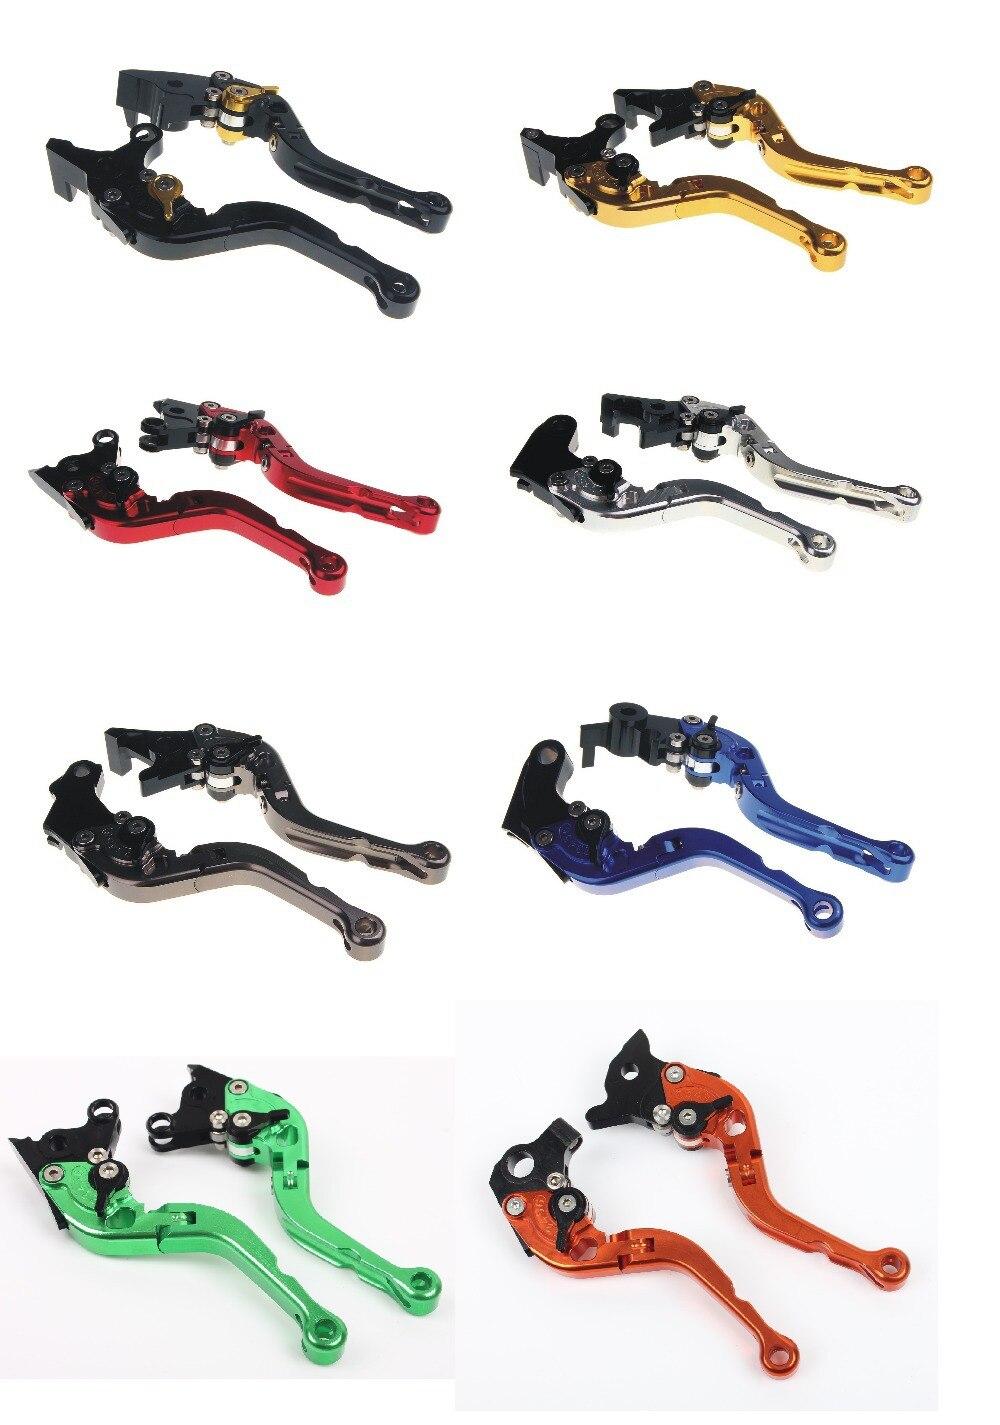 ФОТО CNC Adjustable Short Folding Brake Clutch Lever For BUELL S1 M2 X1 XB12  2009 2010 2011